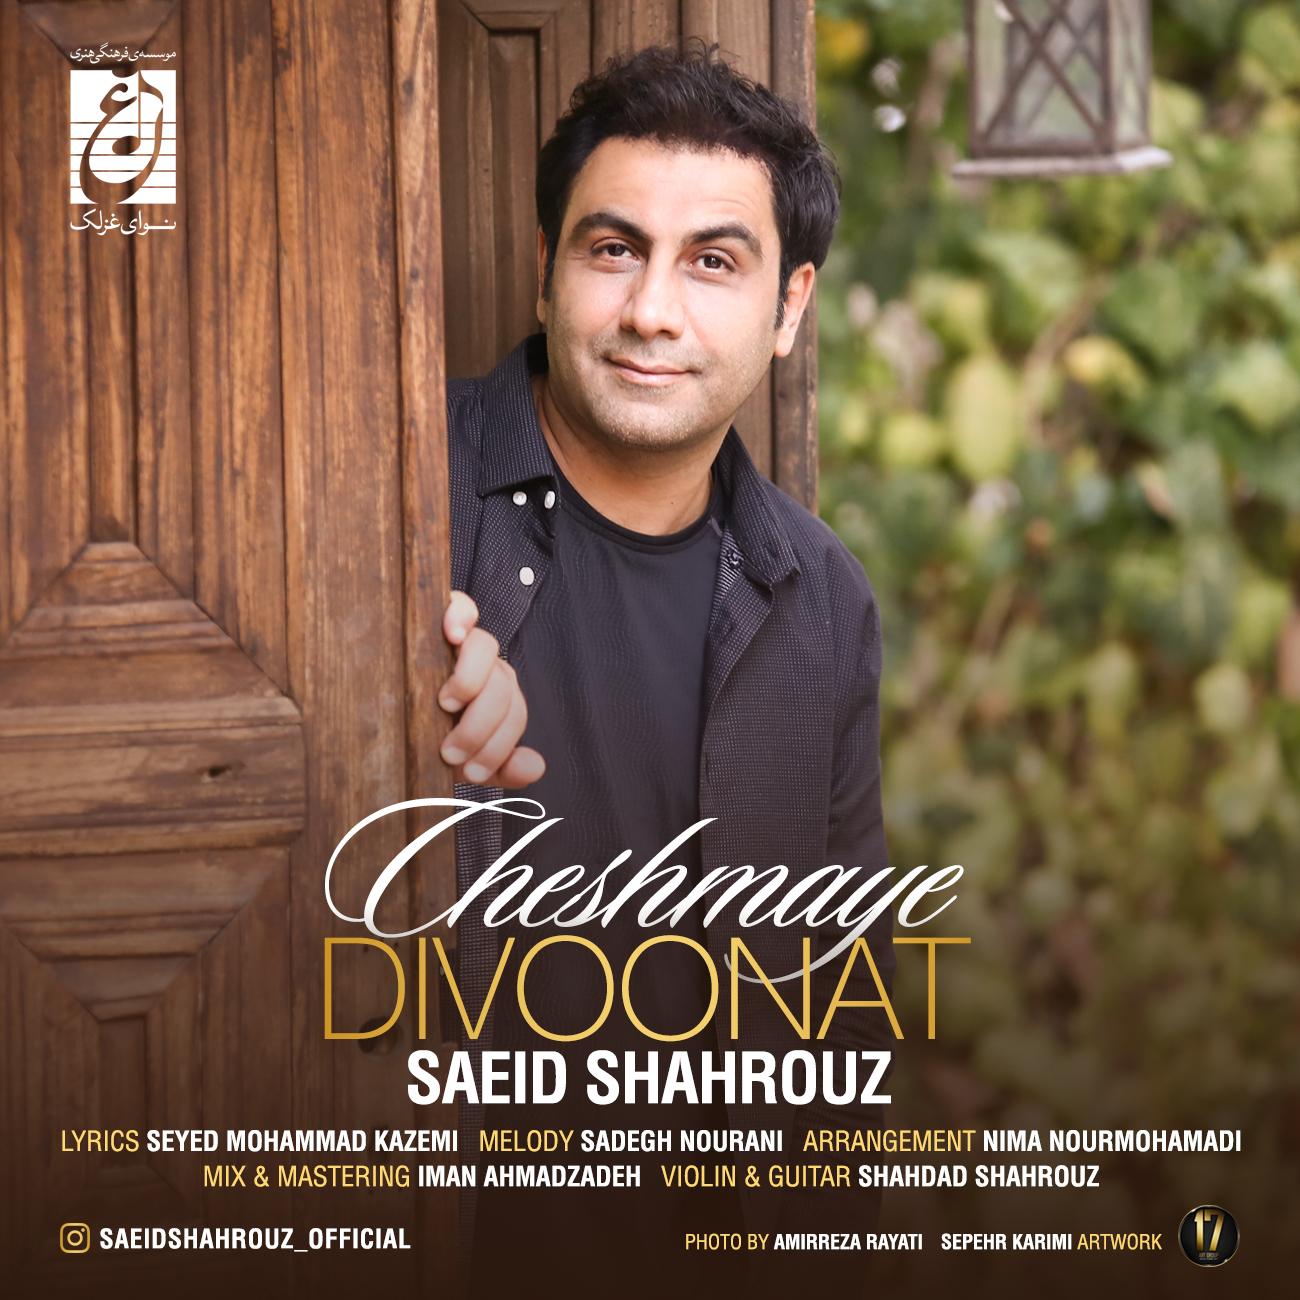 Saeid Shahrouz – Cheshmaye Divoonat